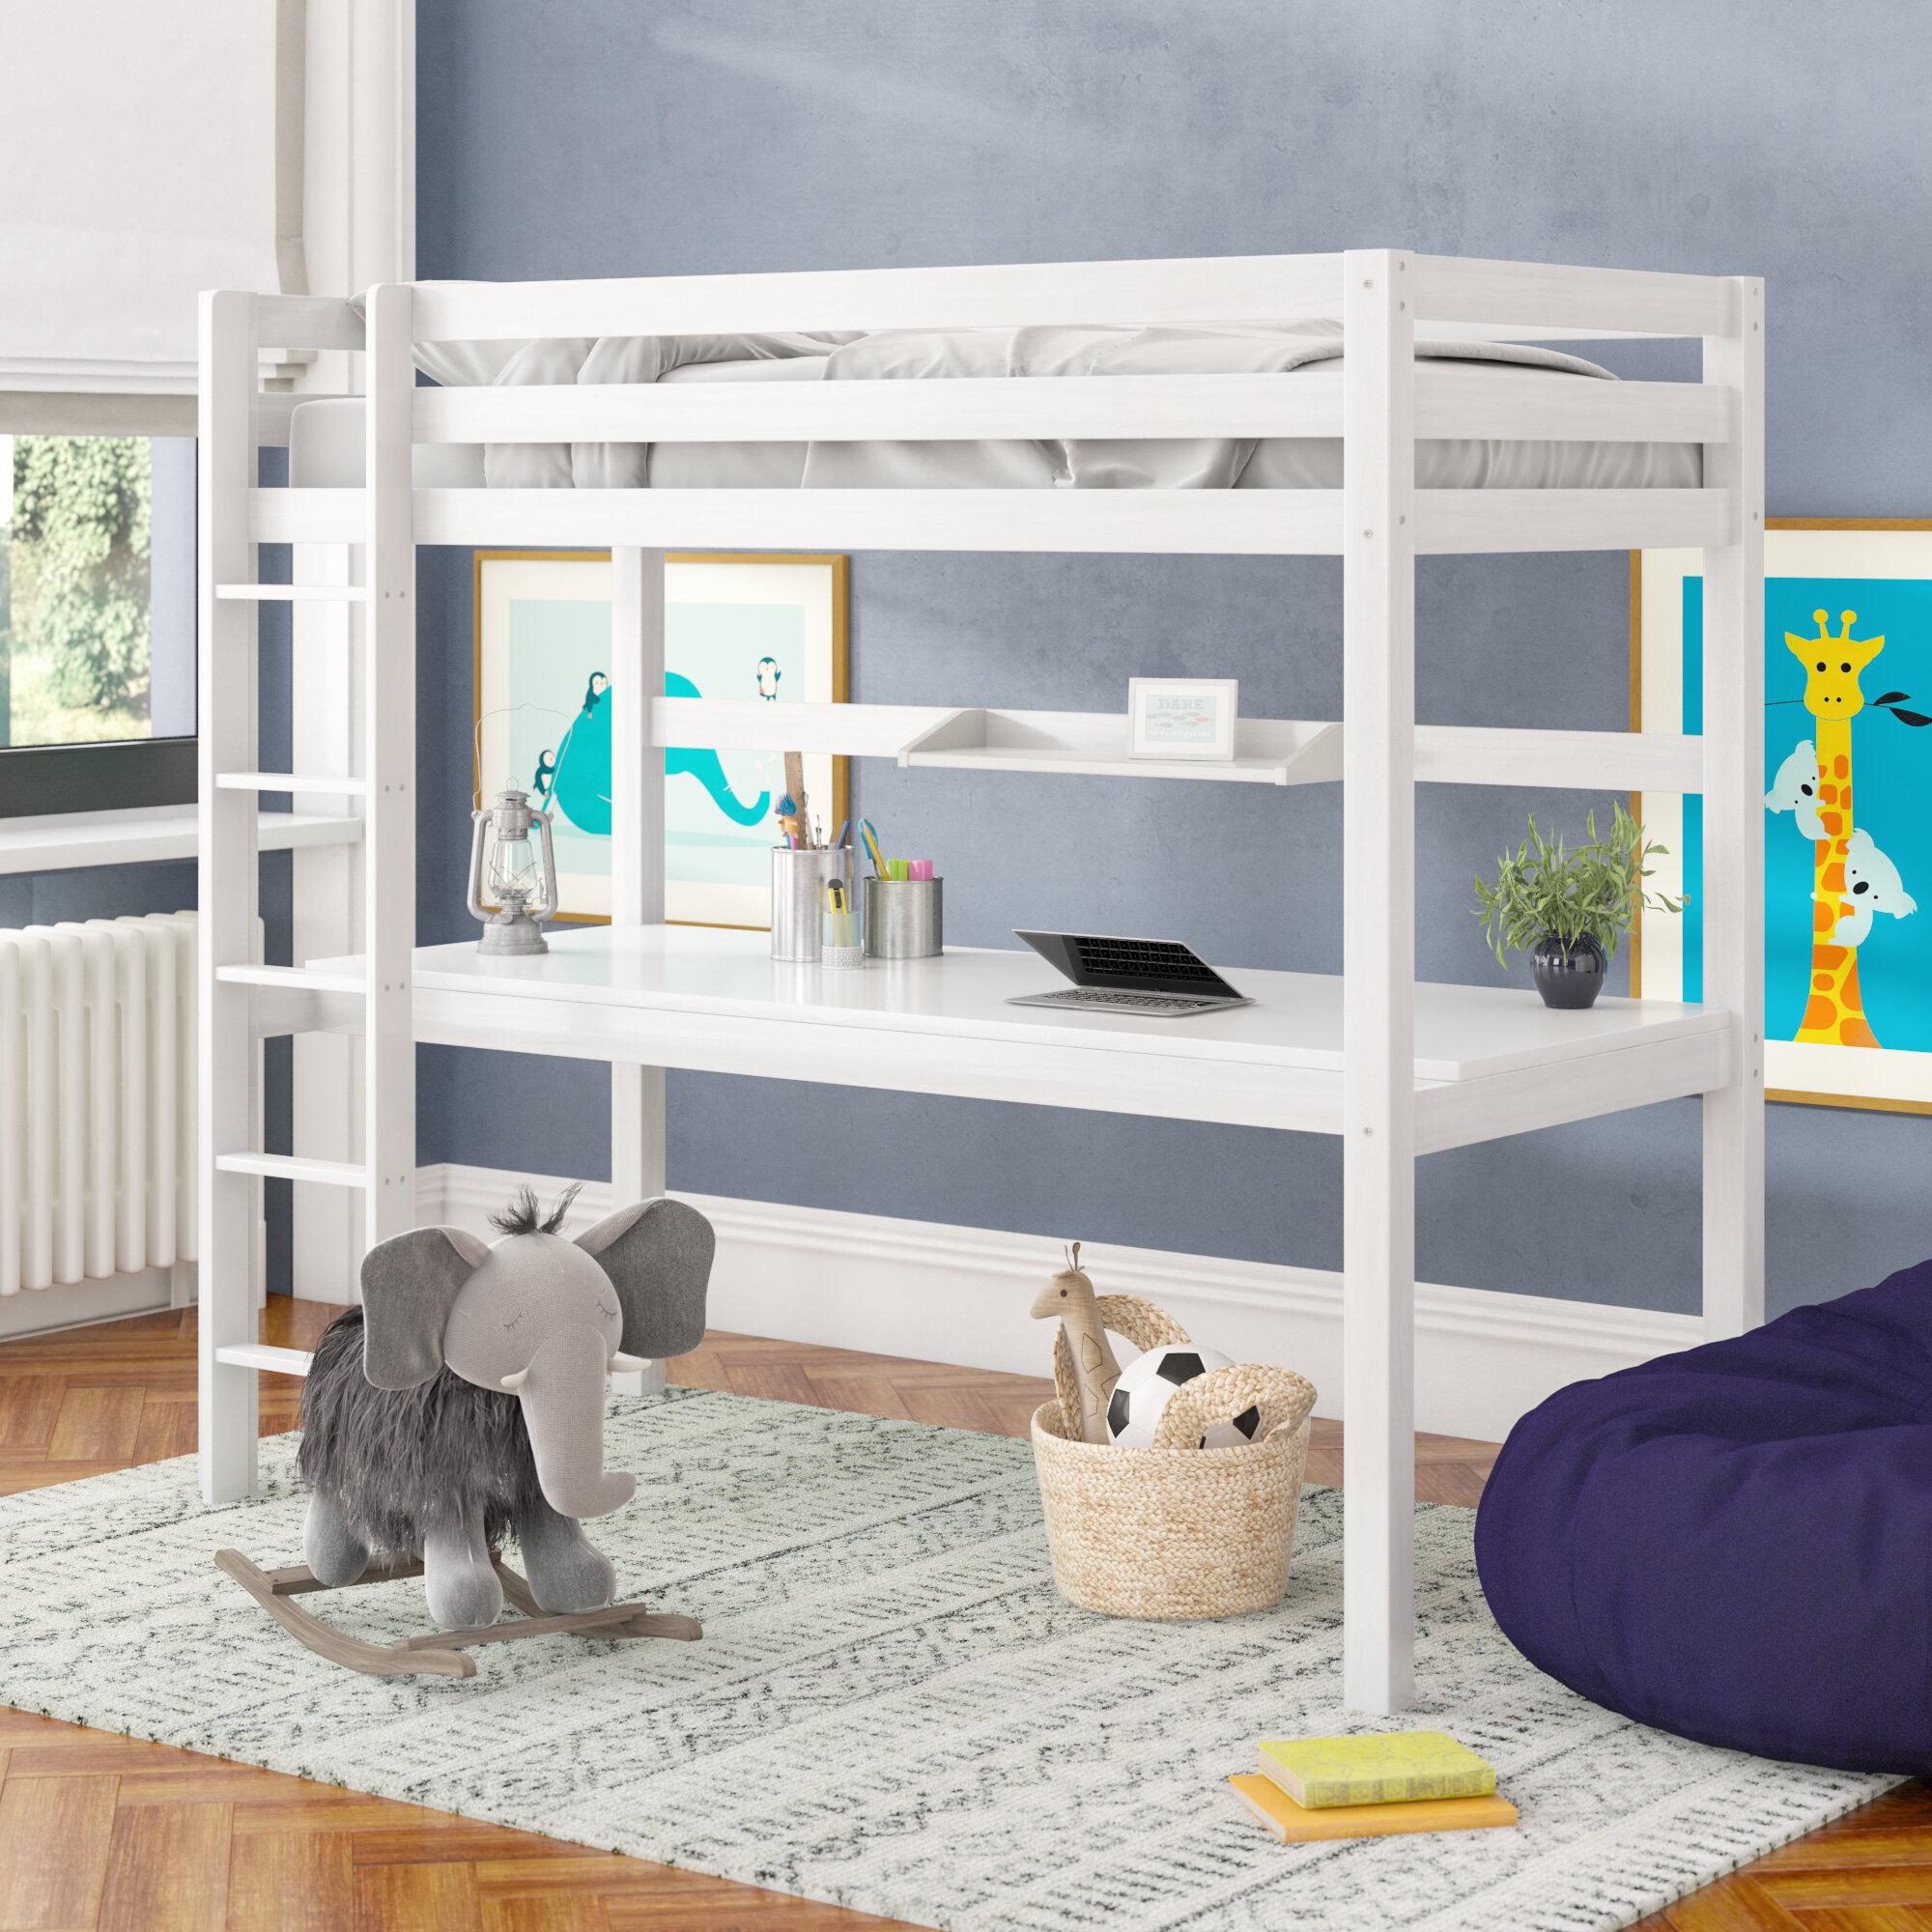 9ebf0f640cf9 Vipack Pino European Single High Sleeper Bed with Desk | Wayfair.co.uk